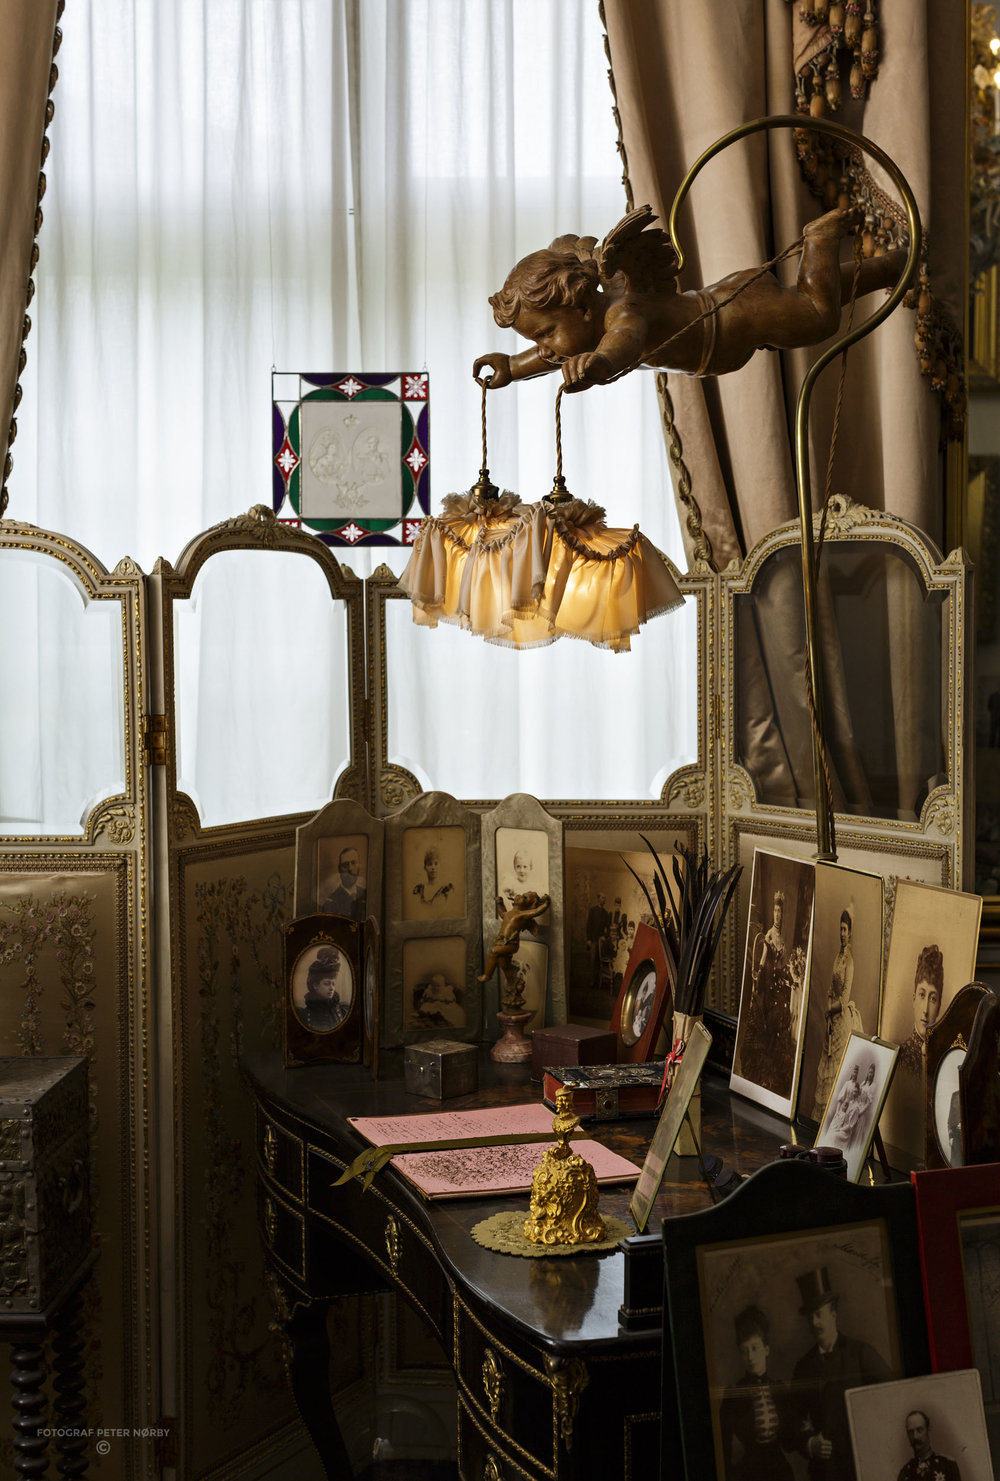 Queen Louise's salon